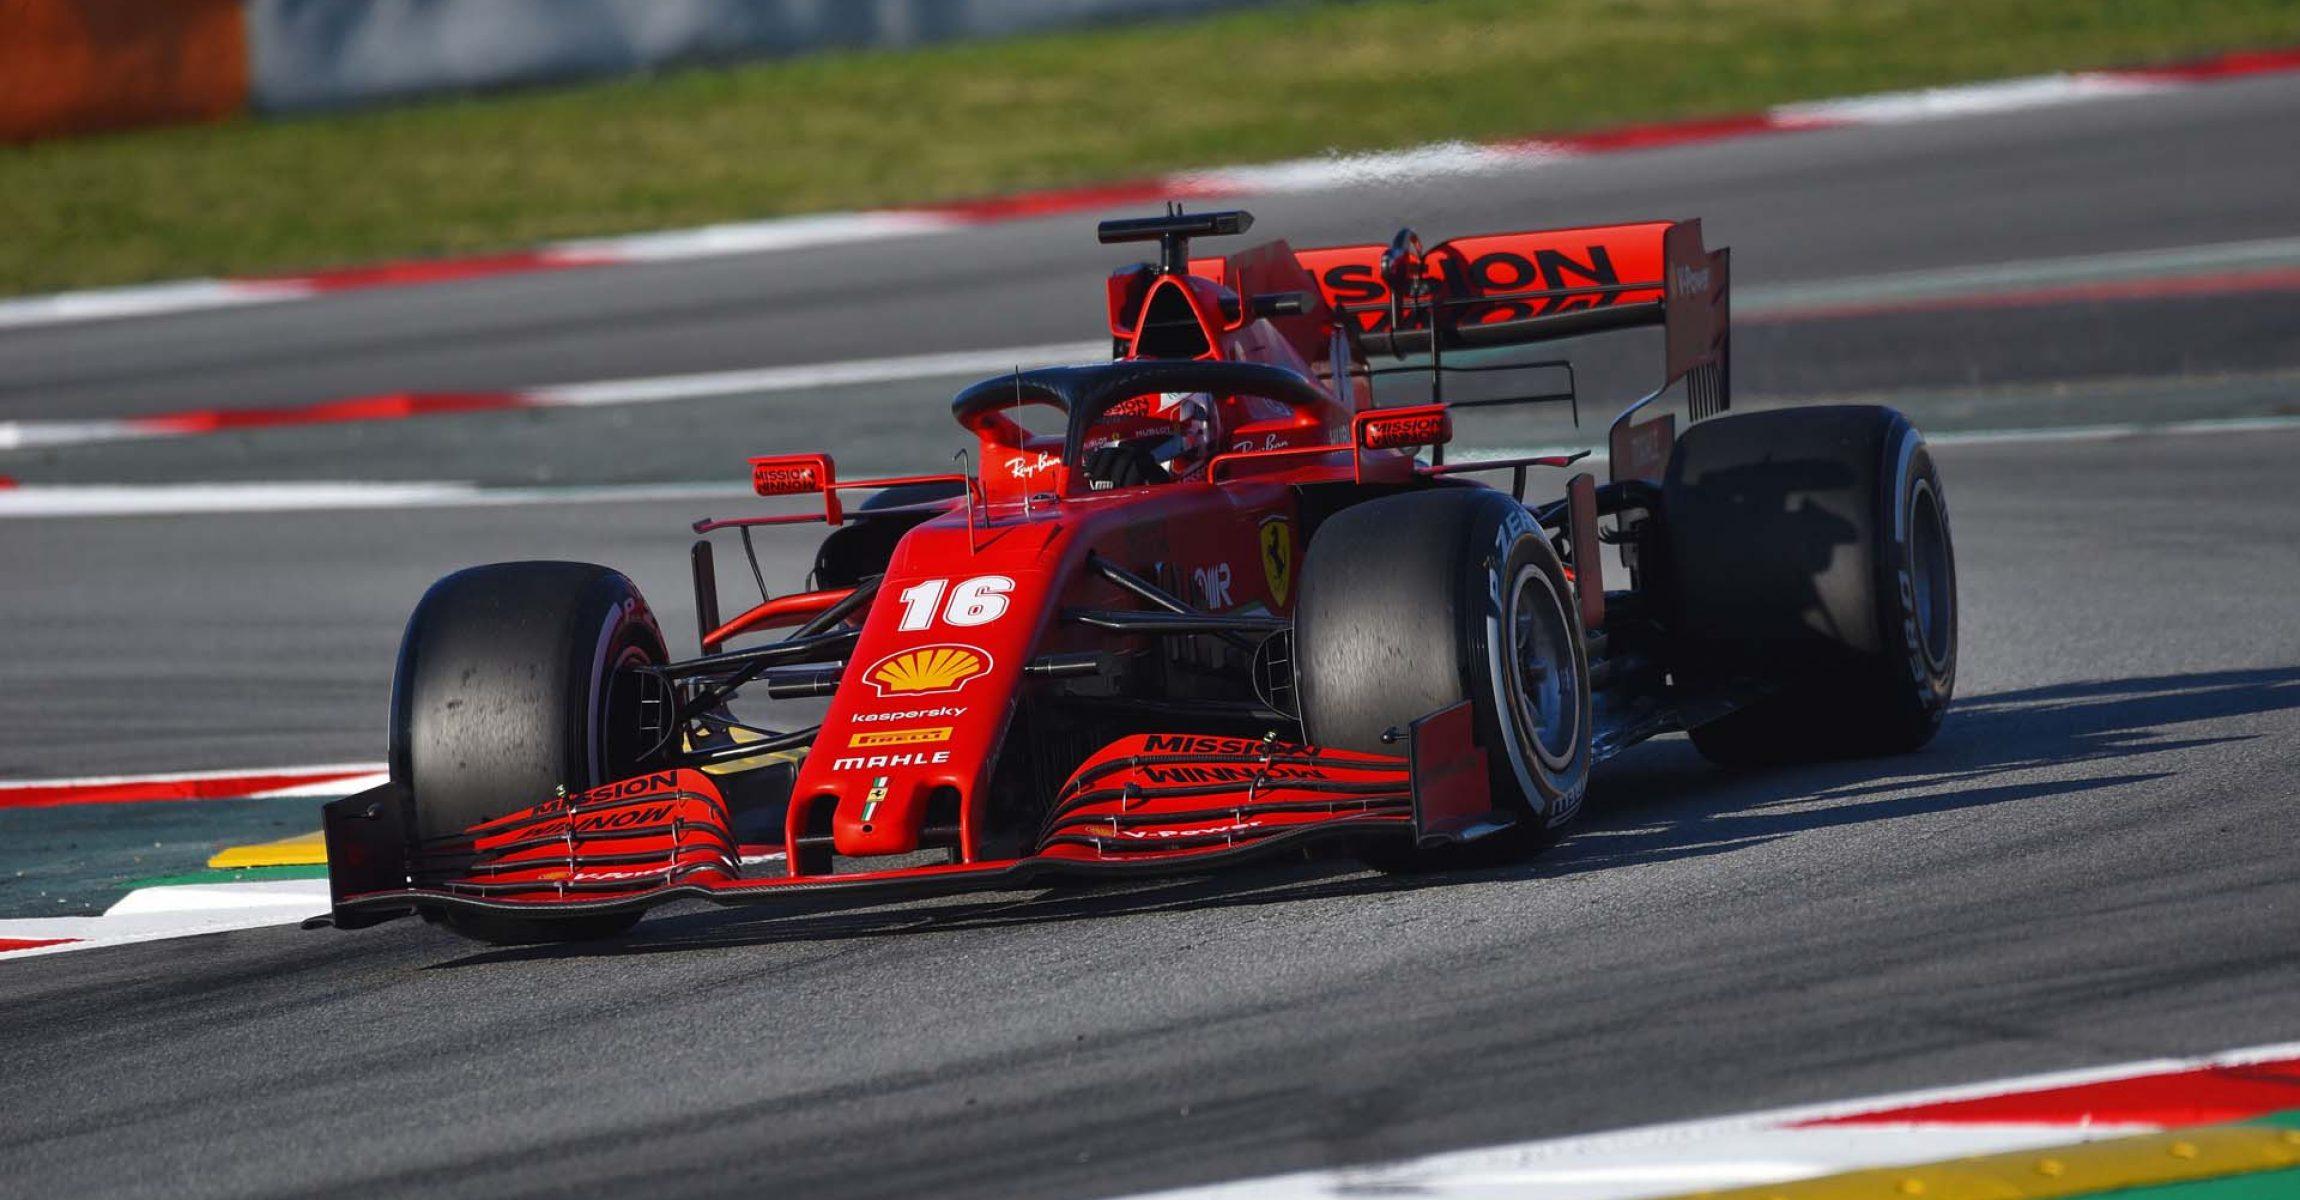 TEST T2 BARCELLONA - VENERDÌ 28/02/20  - CHARLES LECLERC  © Scuderia Ferrari Press Office